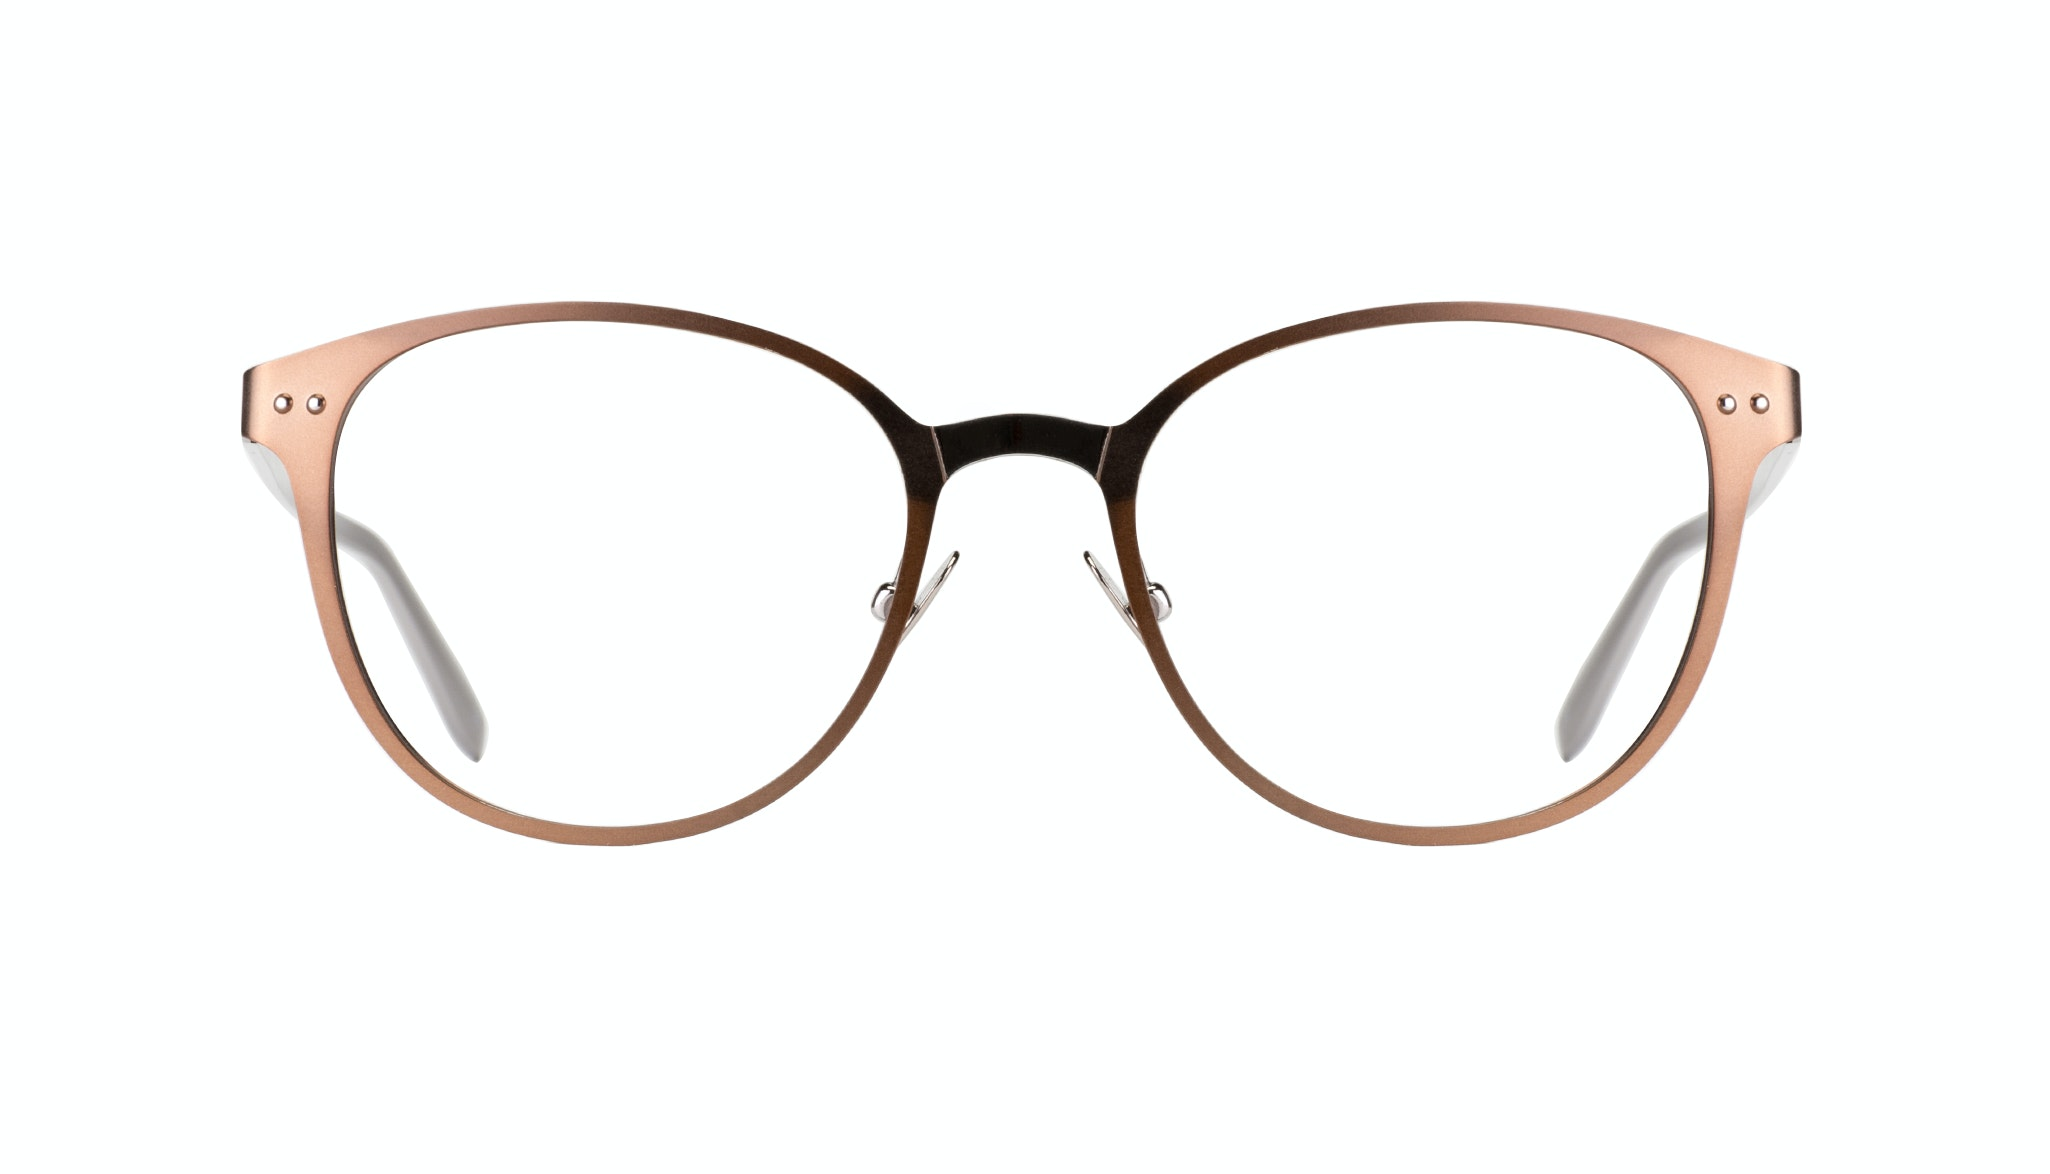 Affordable Fashion Glasses Rectangle Eyeglasses Women Kind Hazel Silver